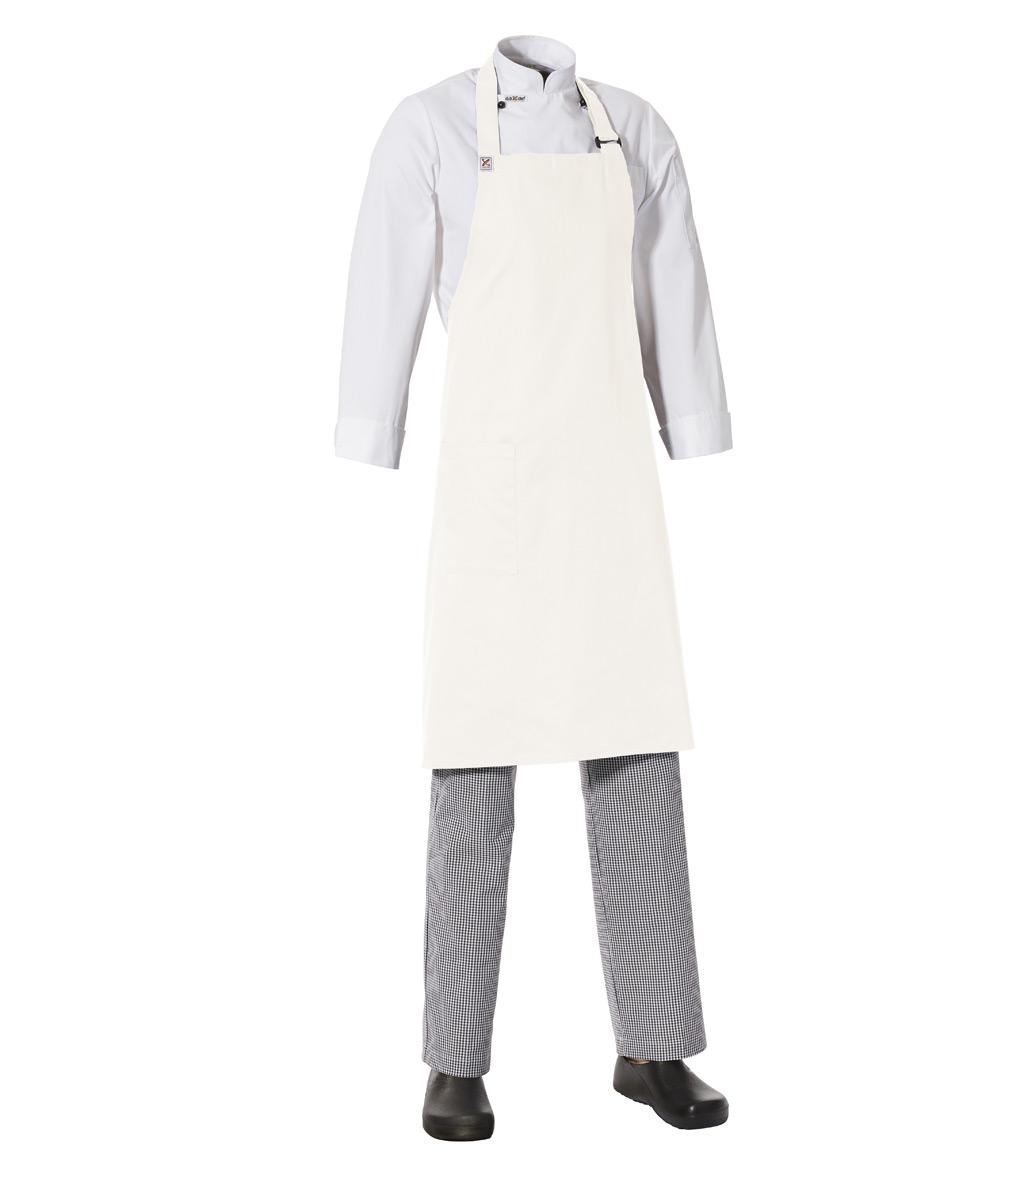 Bib Apron with Side Pocket by Club Chef Aprons 7